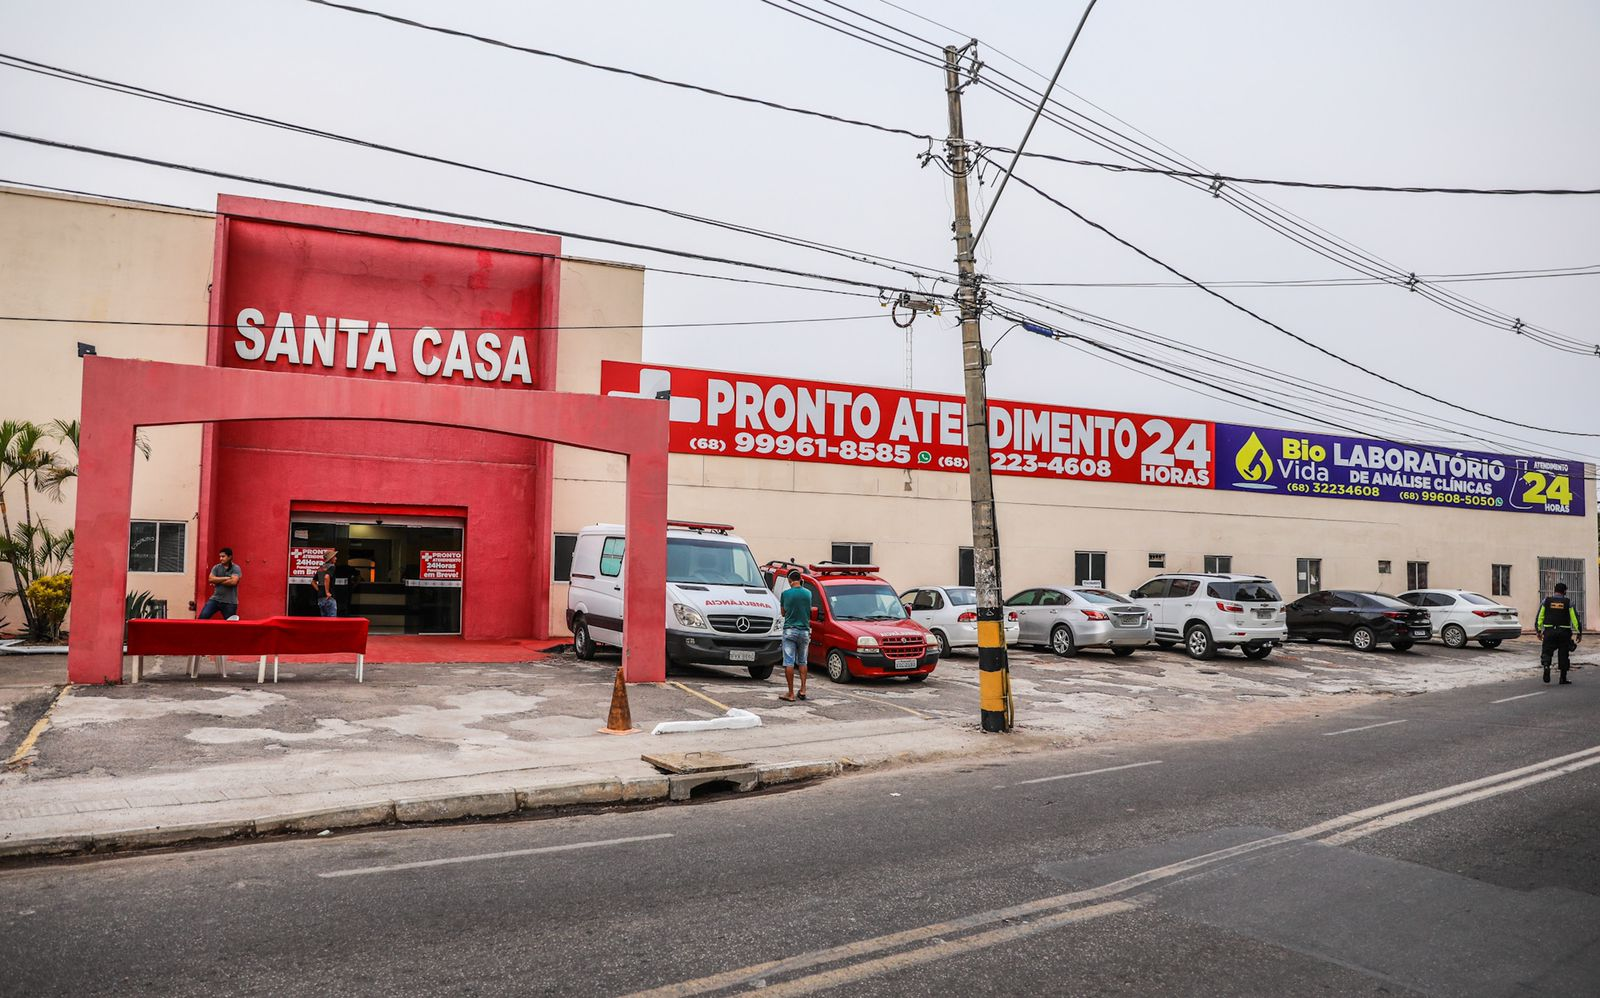 SANTA CASA (12)